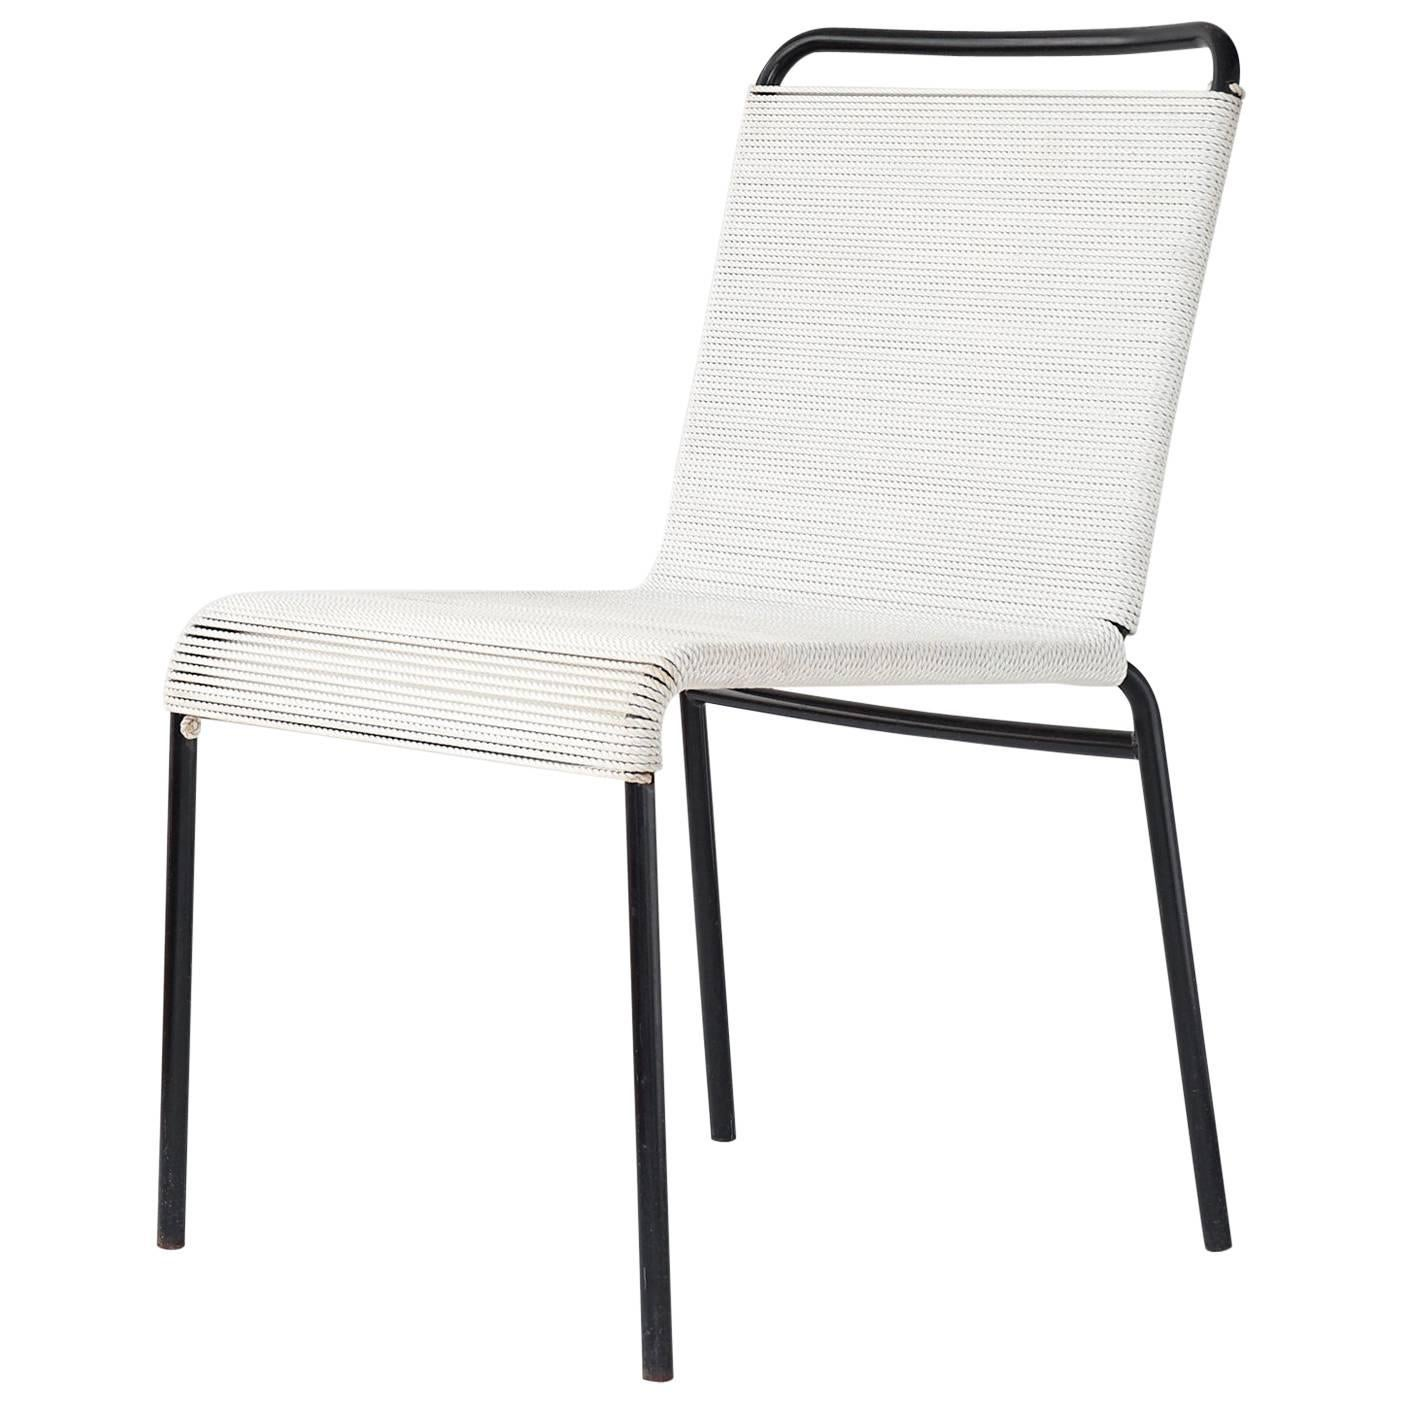 Van Keppel Green String Chair